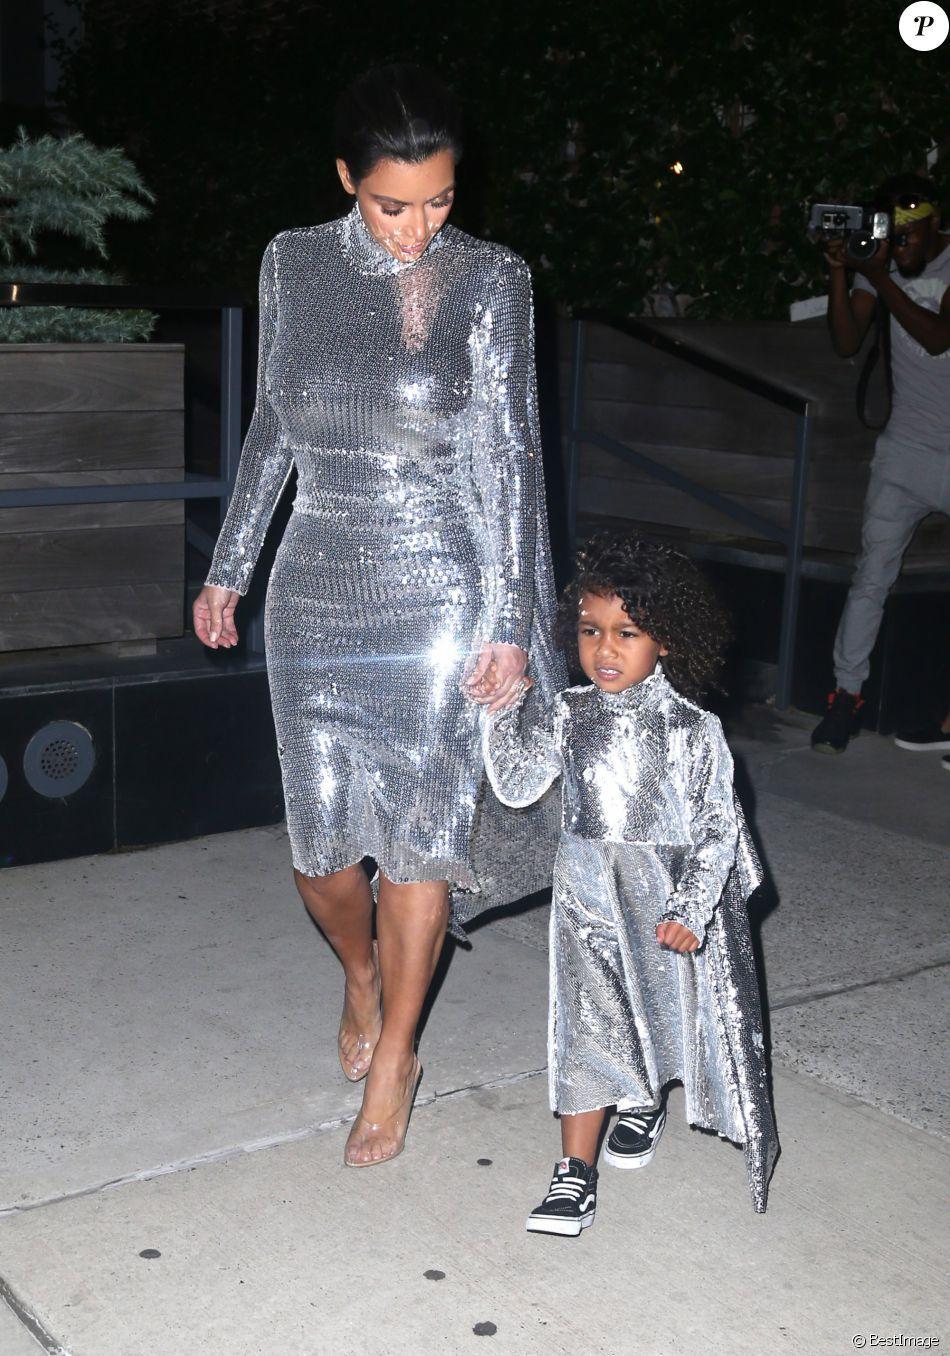 4631548a3a2cf PHOTOS - Kim Kardashian et sa fille North West à New York